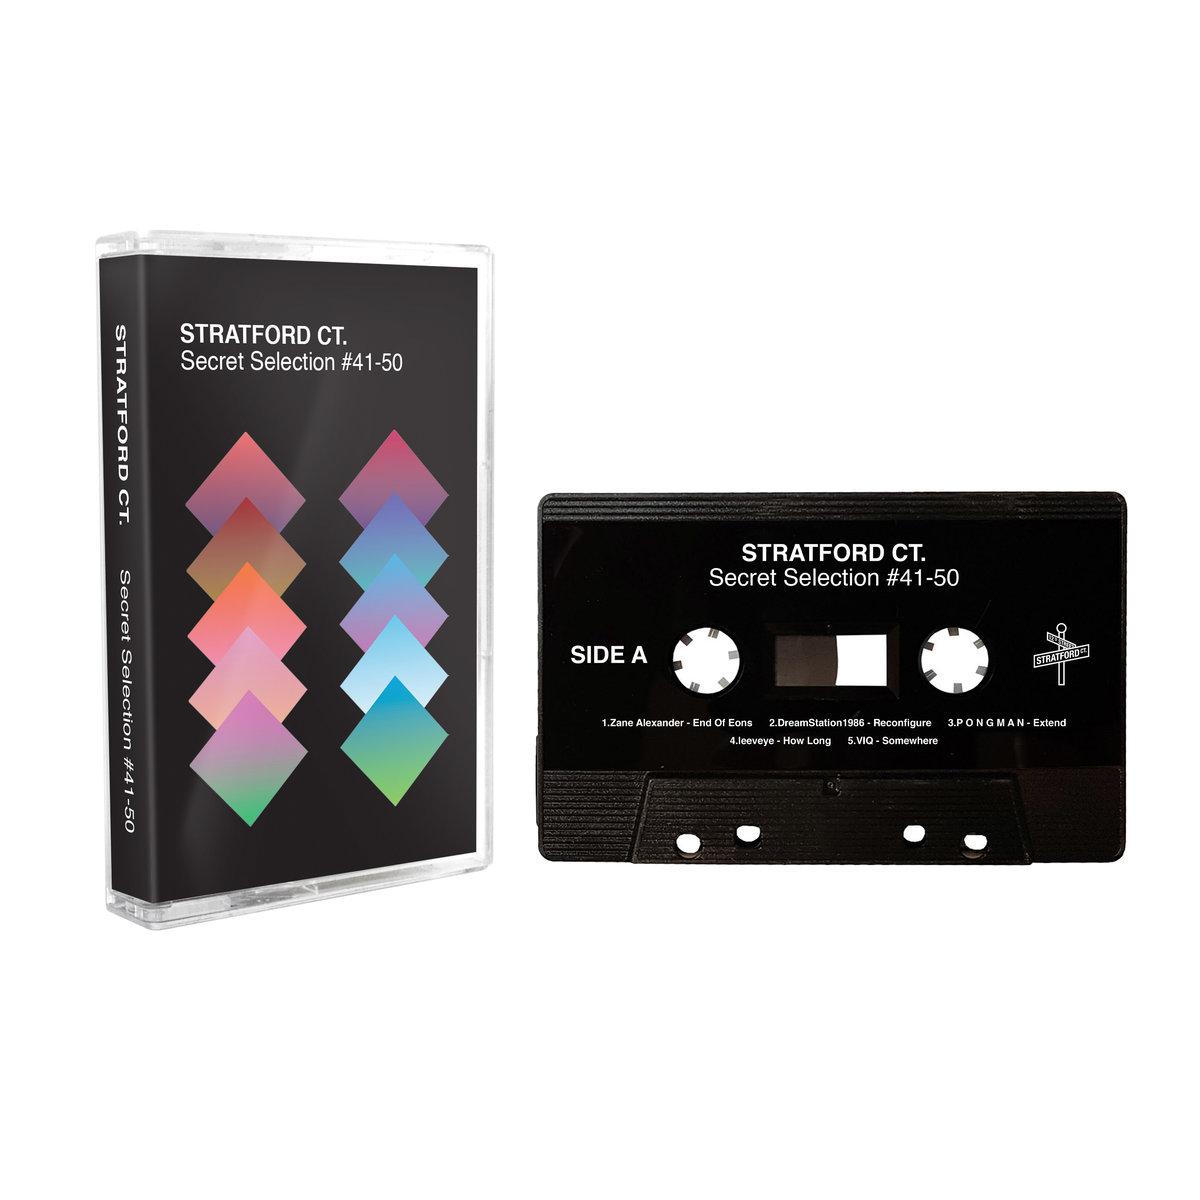 Stratford Ct. | Secret Selection #41-50 by Ѕtratford Ct. (Cassette) 2